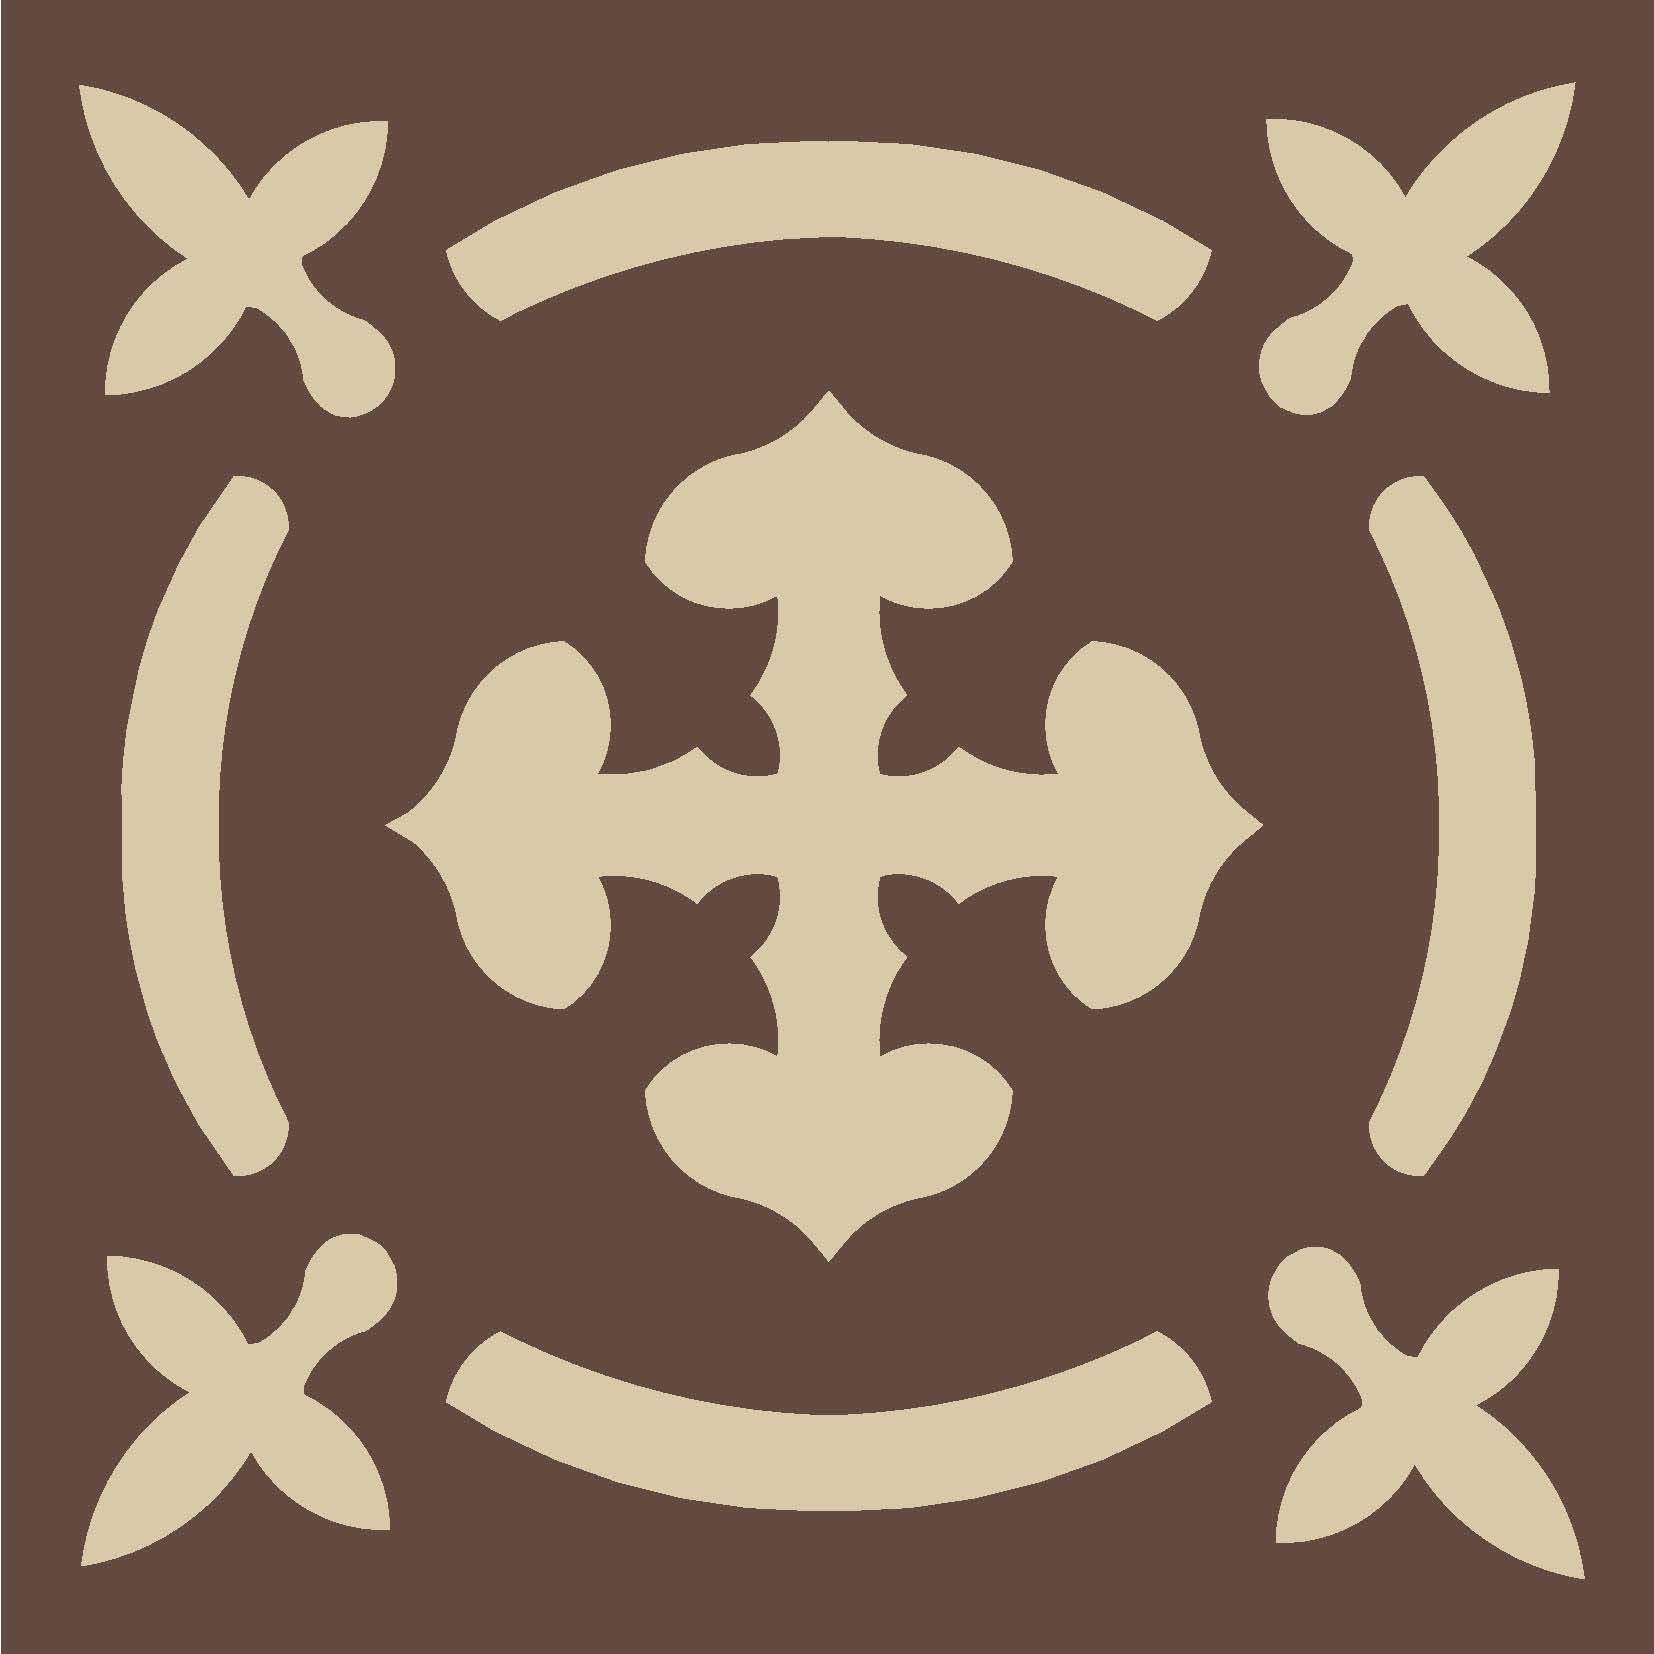 enc08-chocolat ivoire.jpg